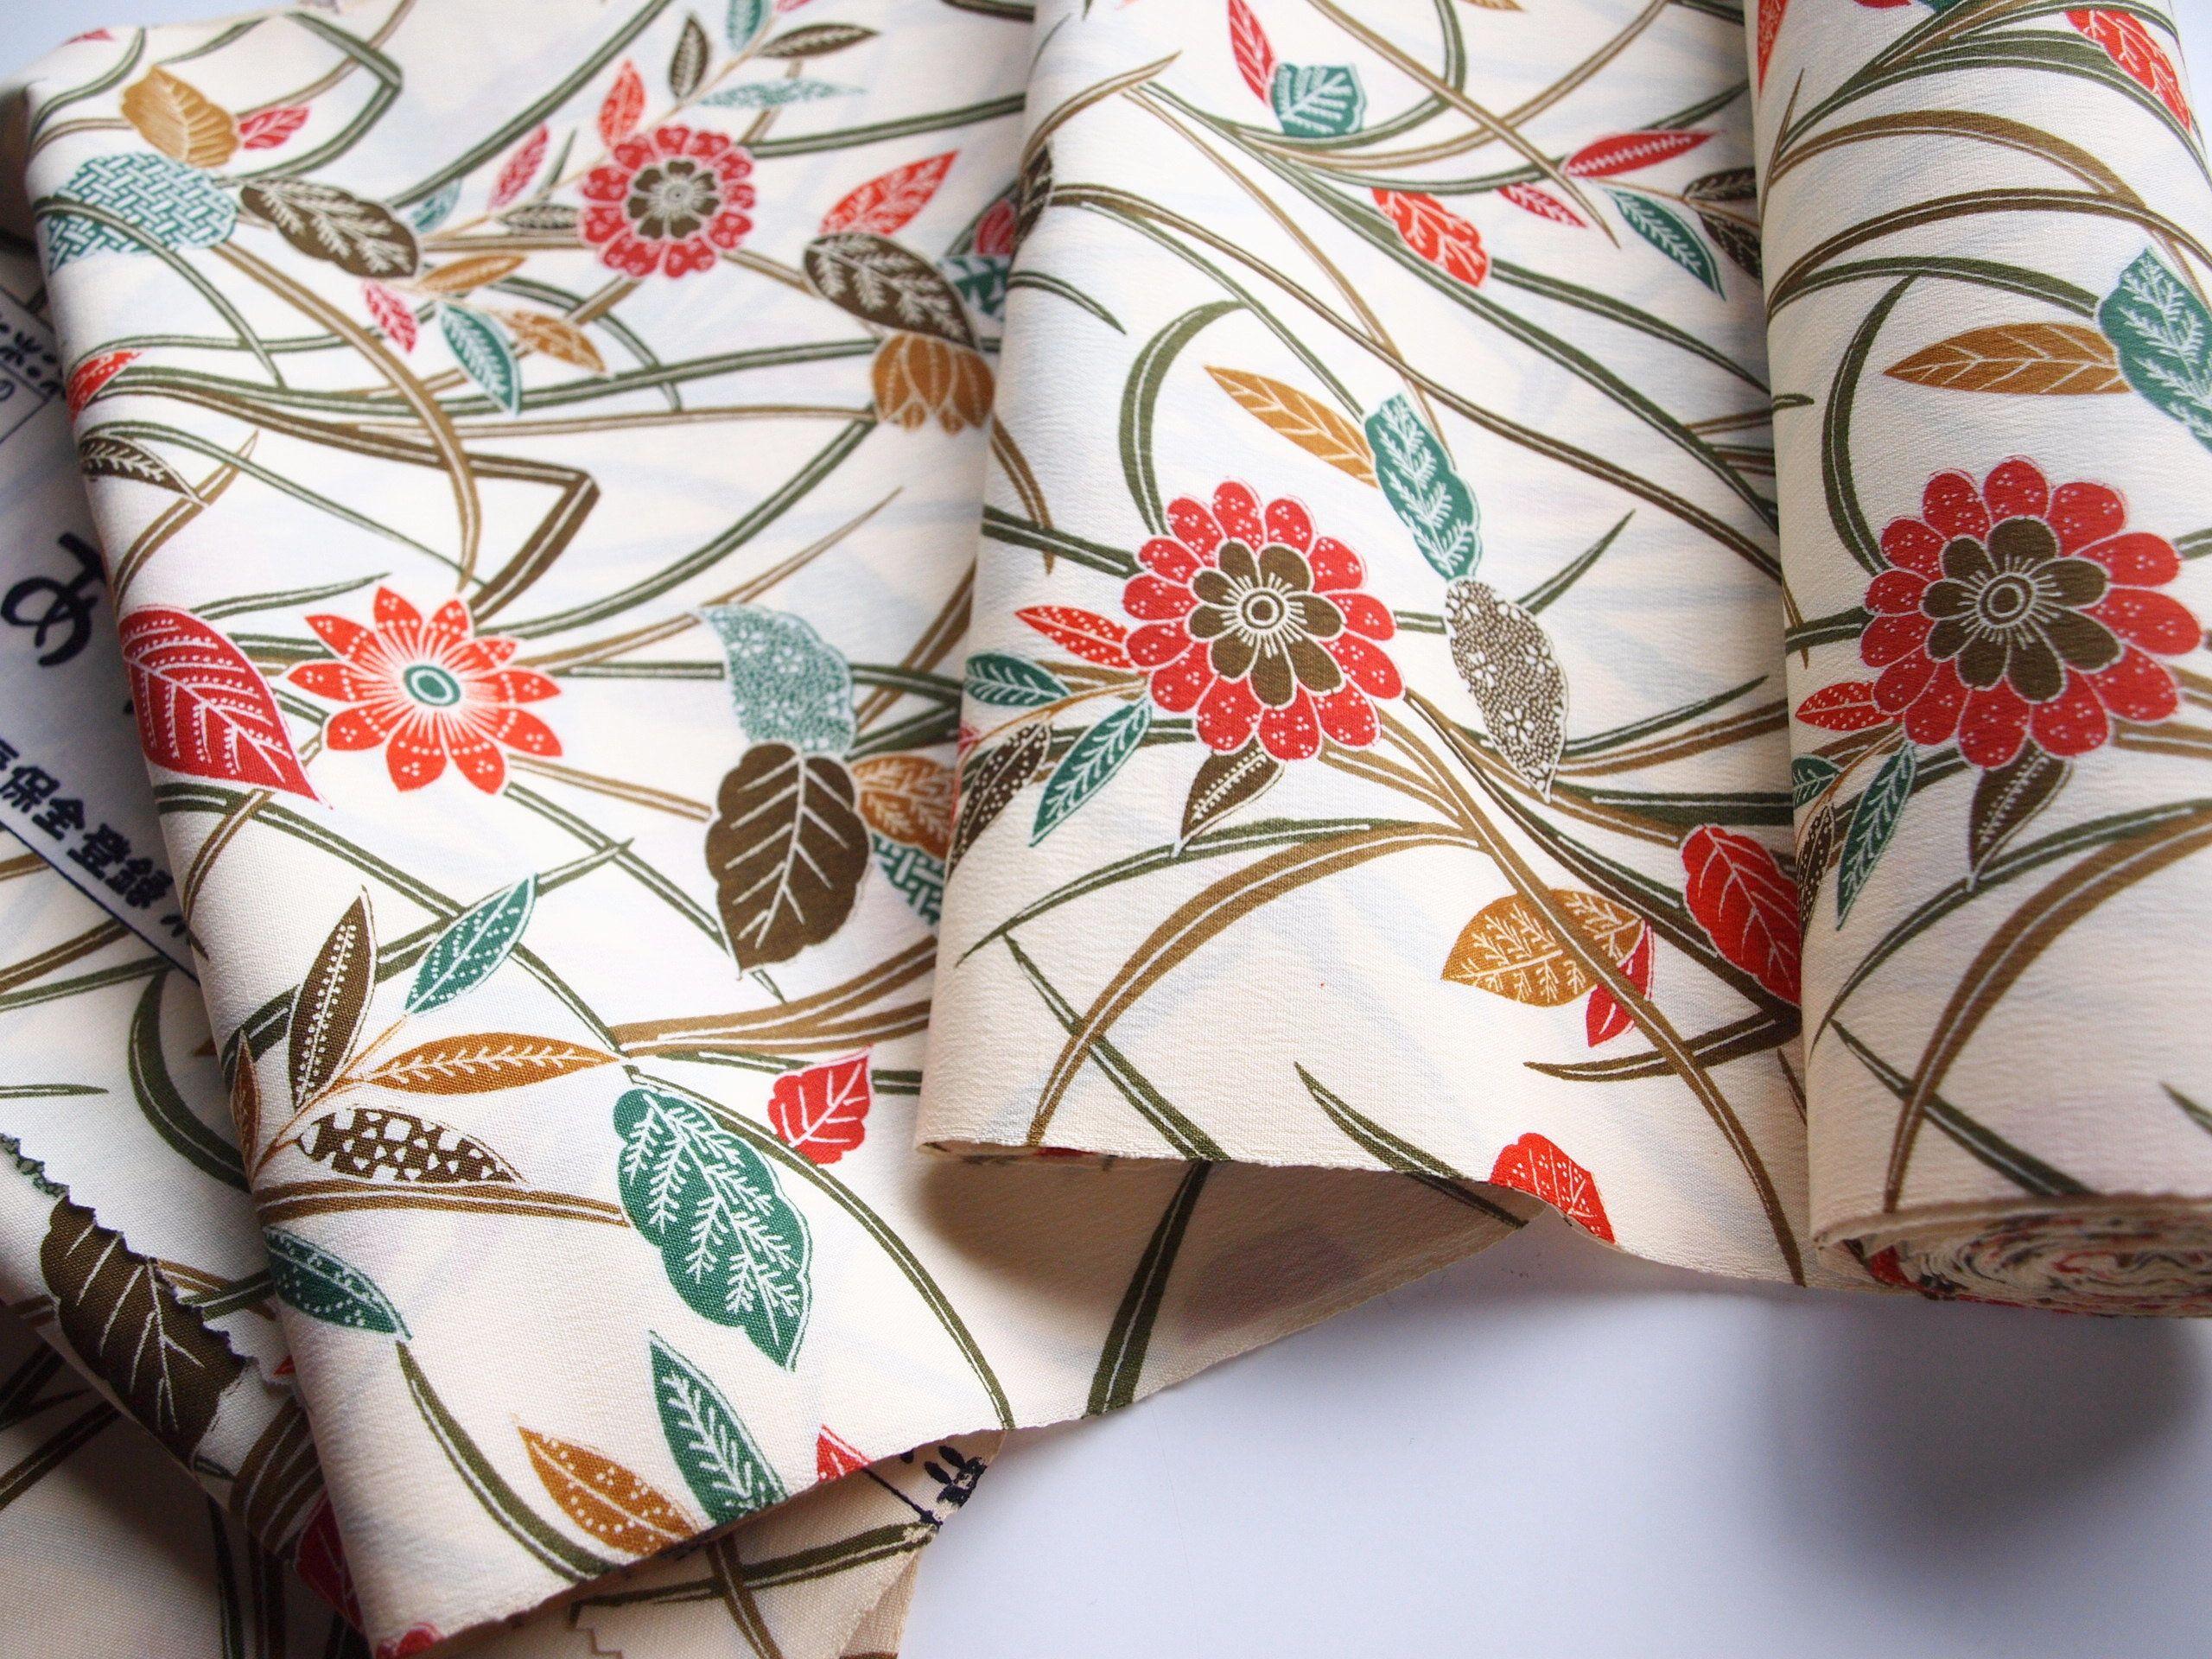 Floral Wool Kimono Fabric Botanical Pattern Unused Bolt By Etsy